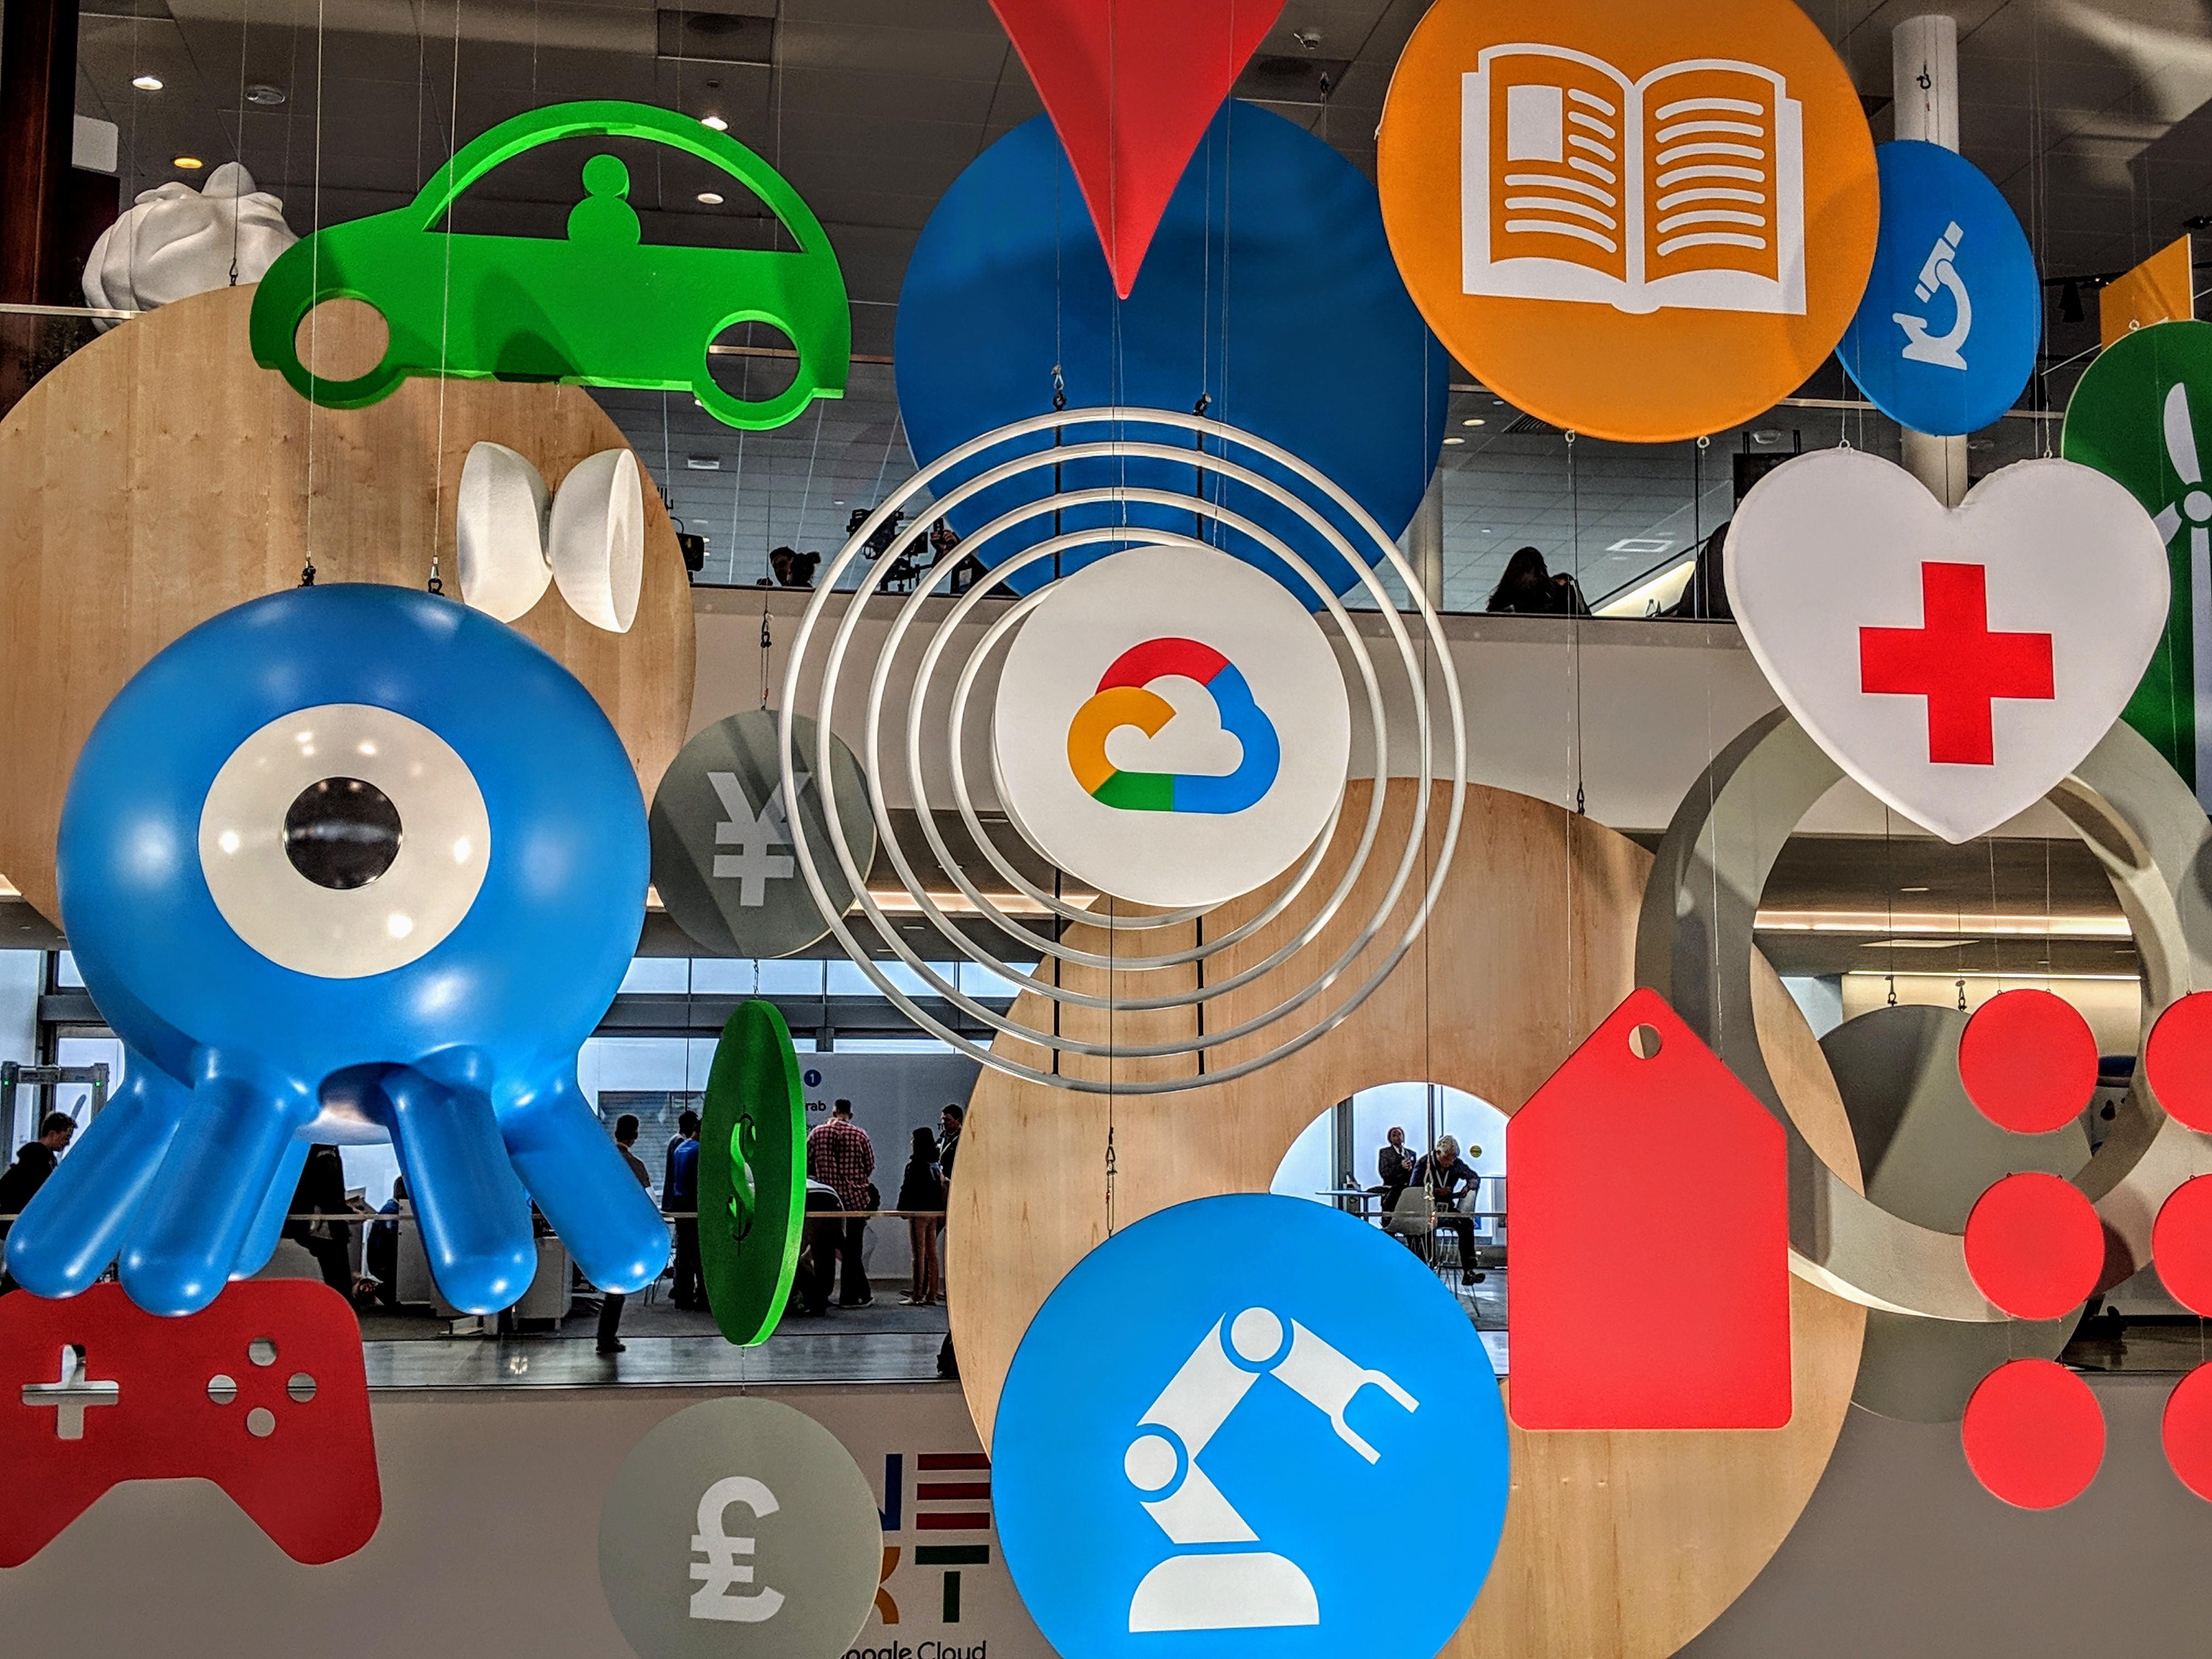 Google launches an end-to-end AI platform | TechCrunch